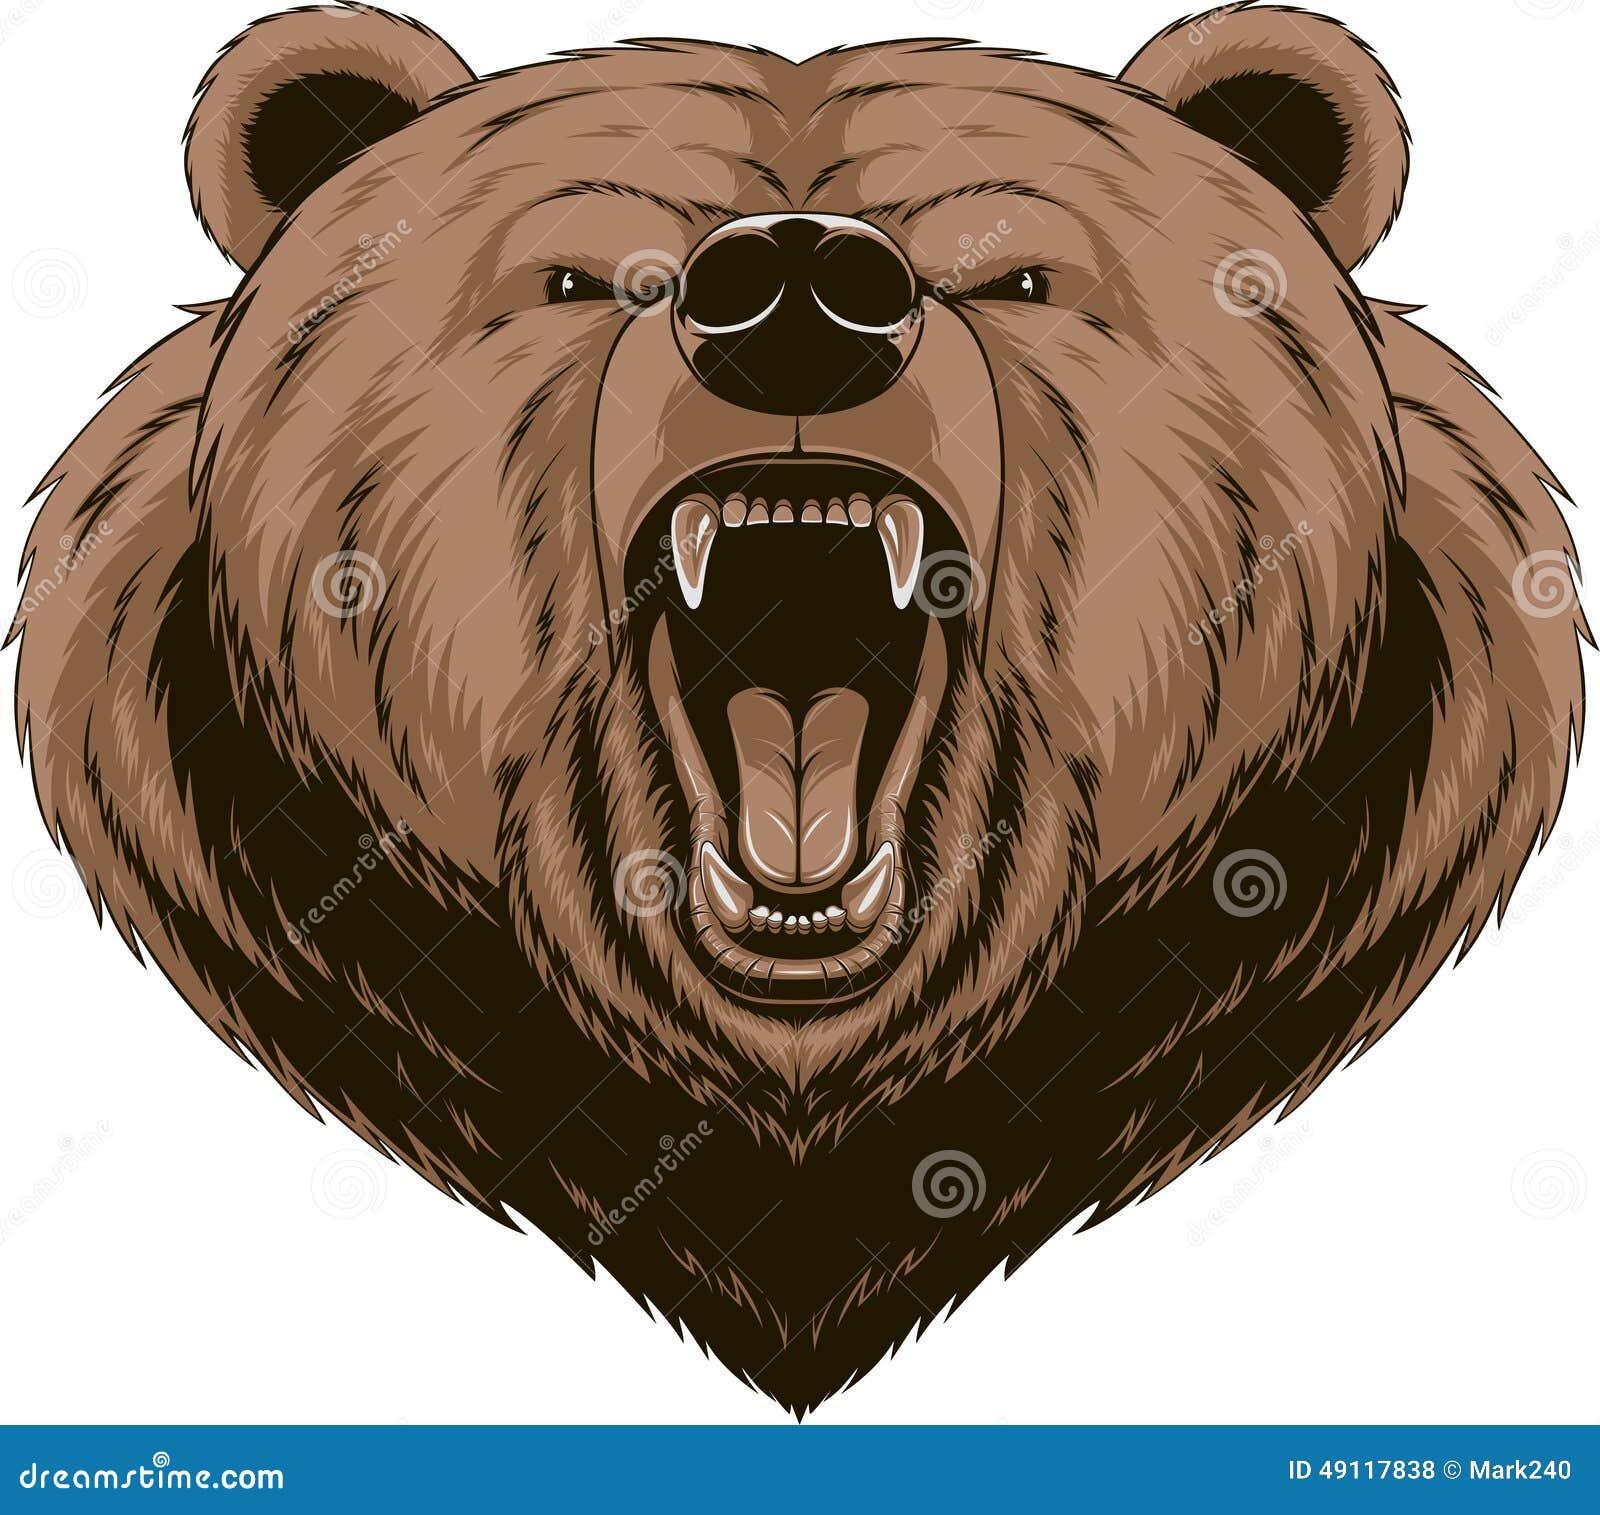 Angry bear head drawing - photo#13